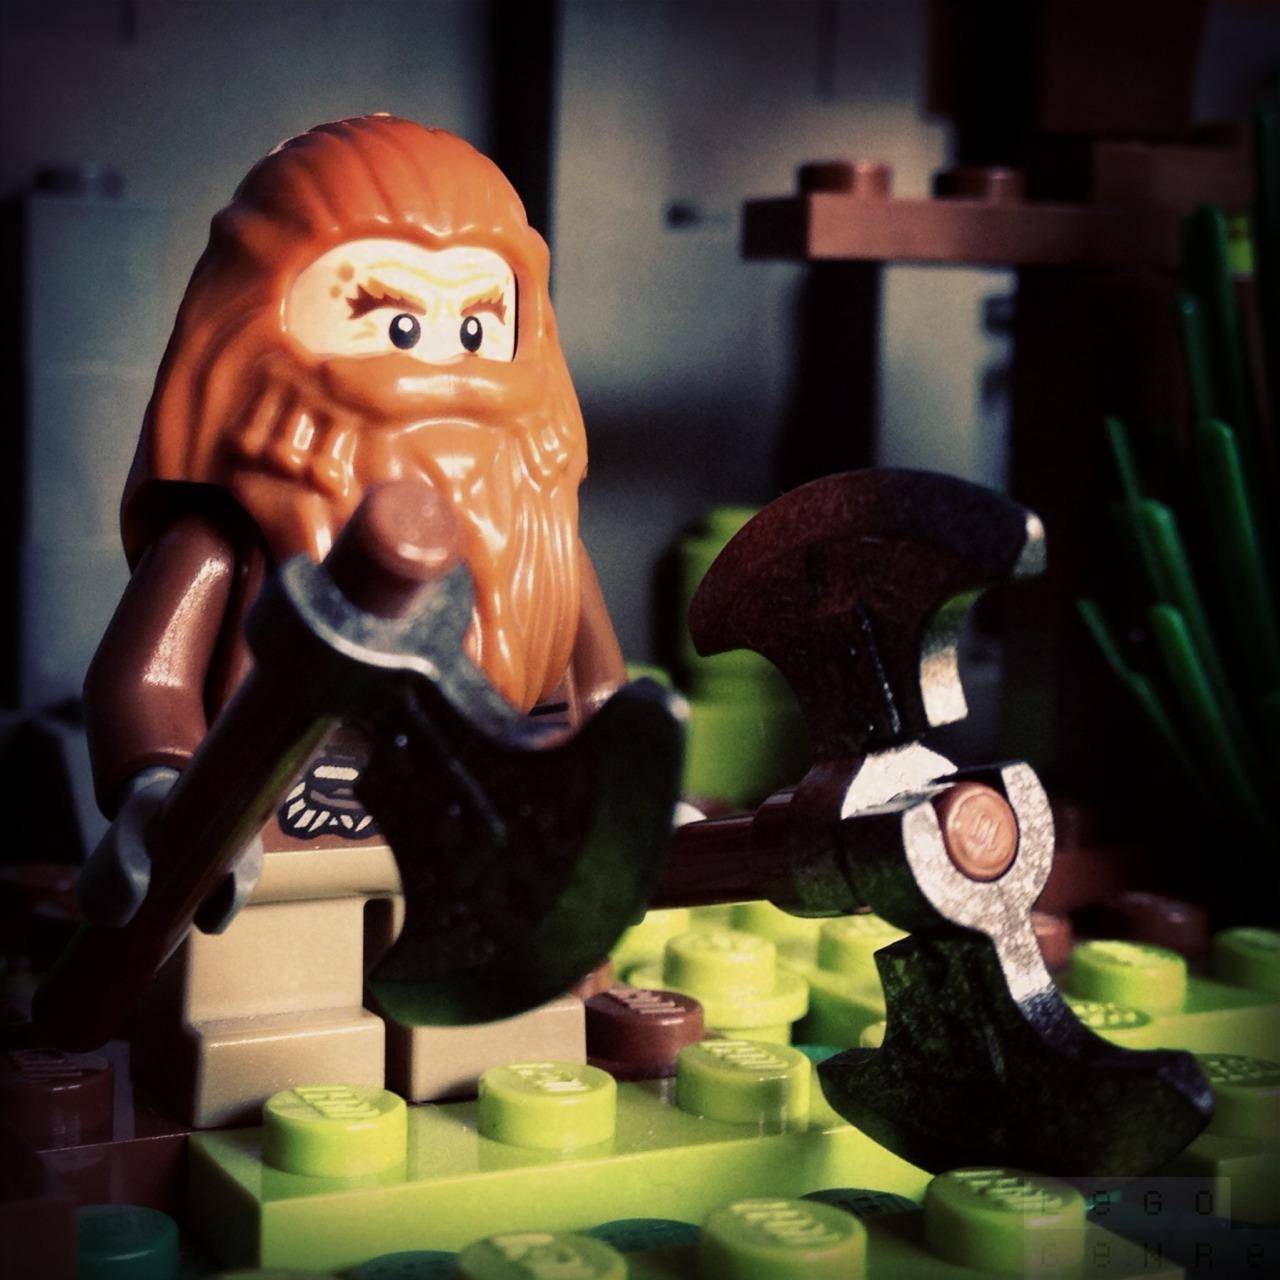 LegoGenre 00237: Glóin, Son Of Gróin, Brother Of Óin, Father Of Gimli